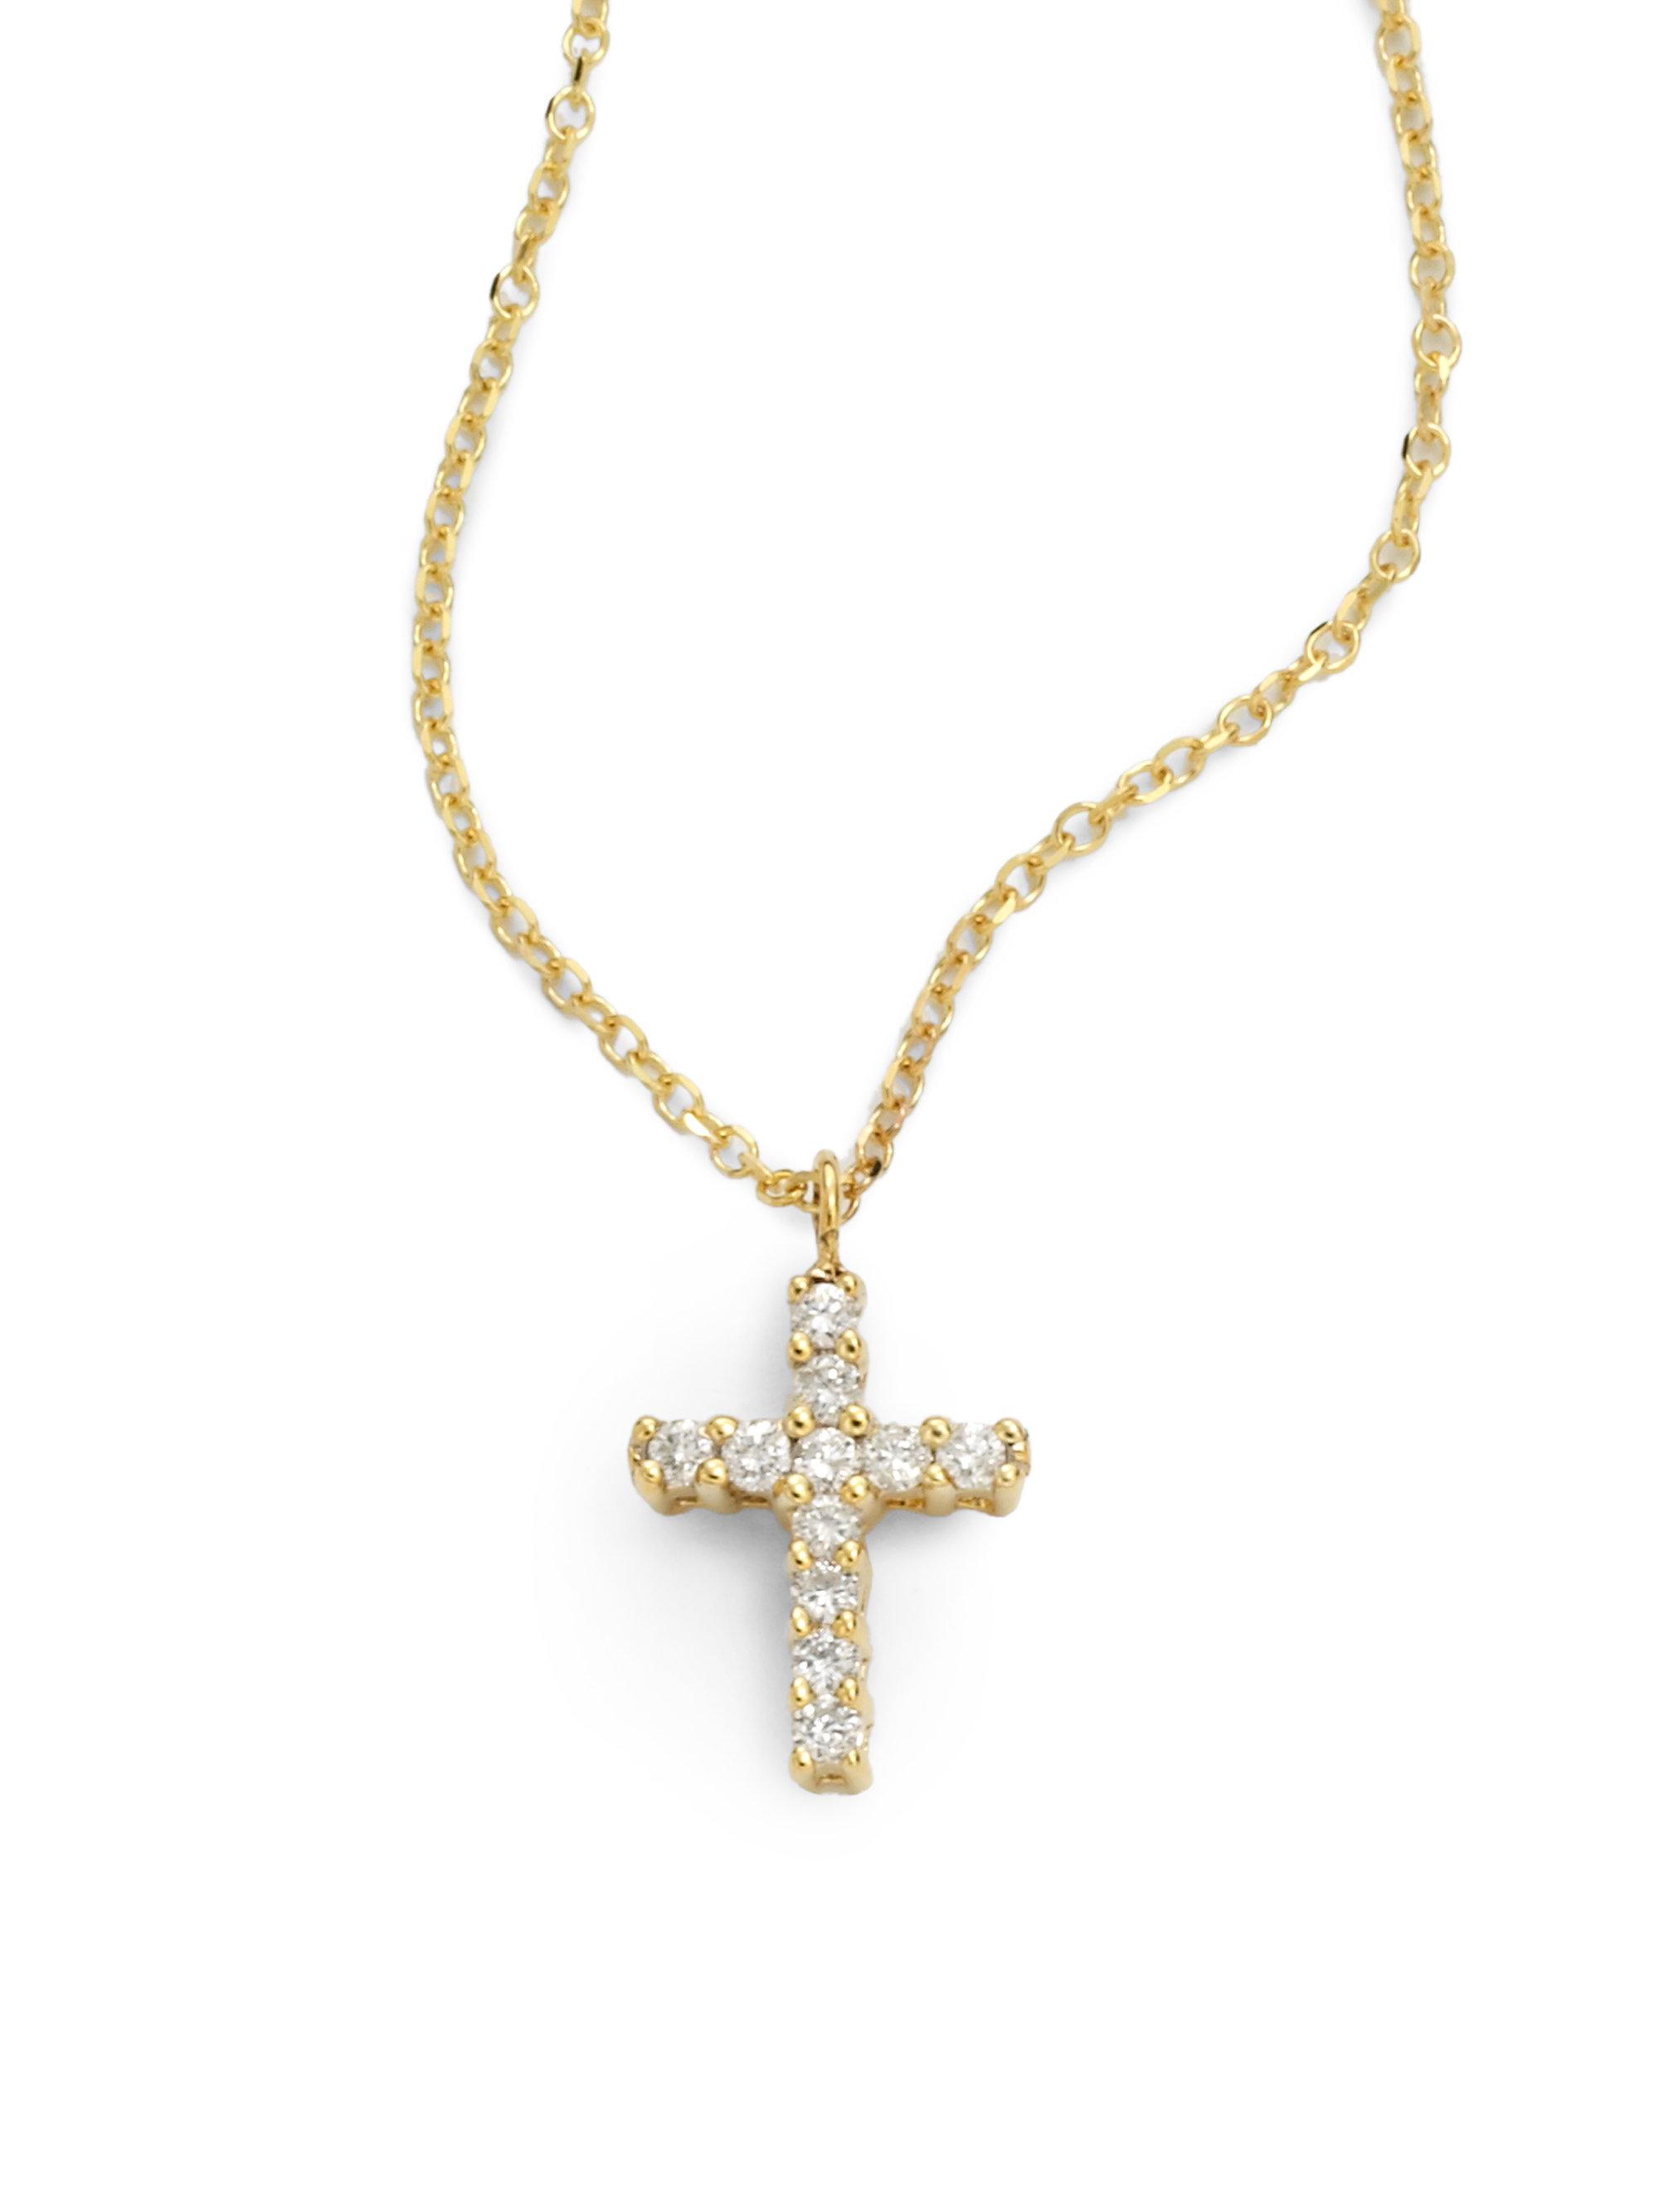 Kc designs Small Diamond Cross Necklace in Metallic